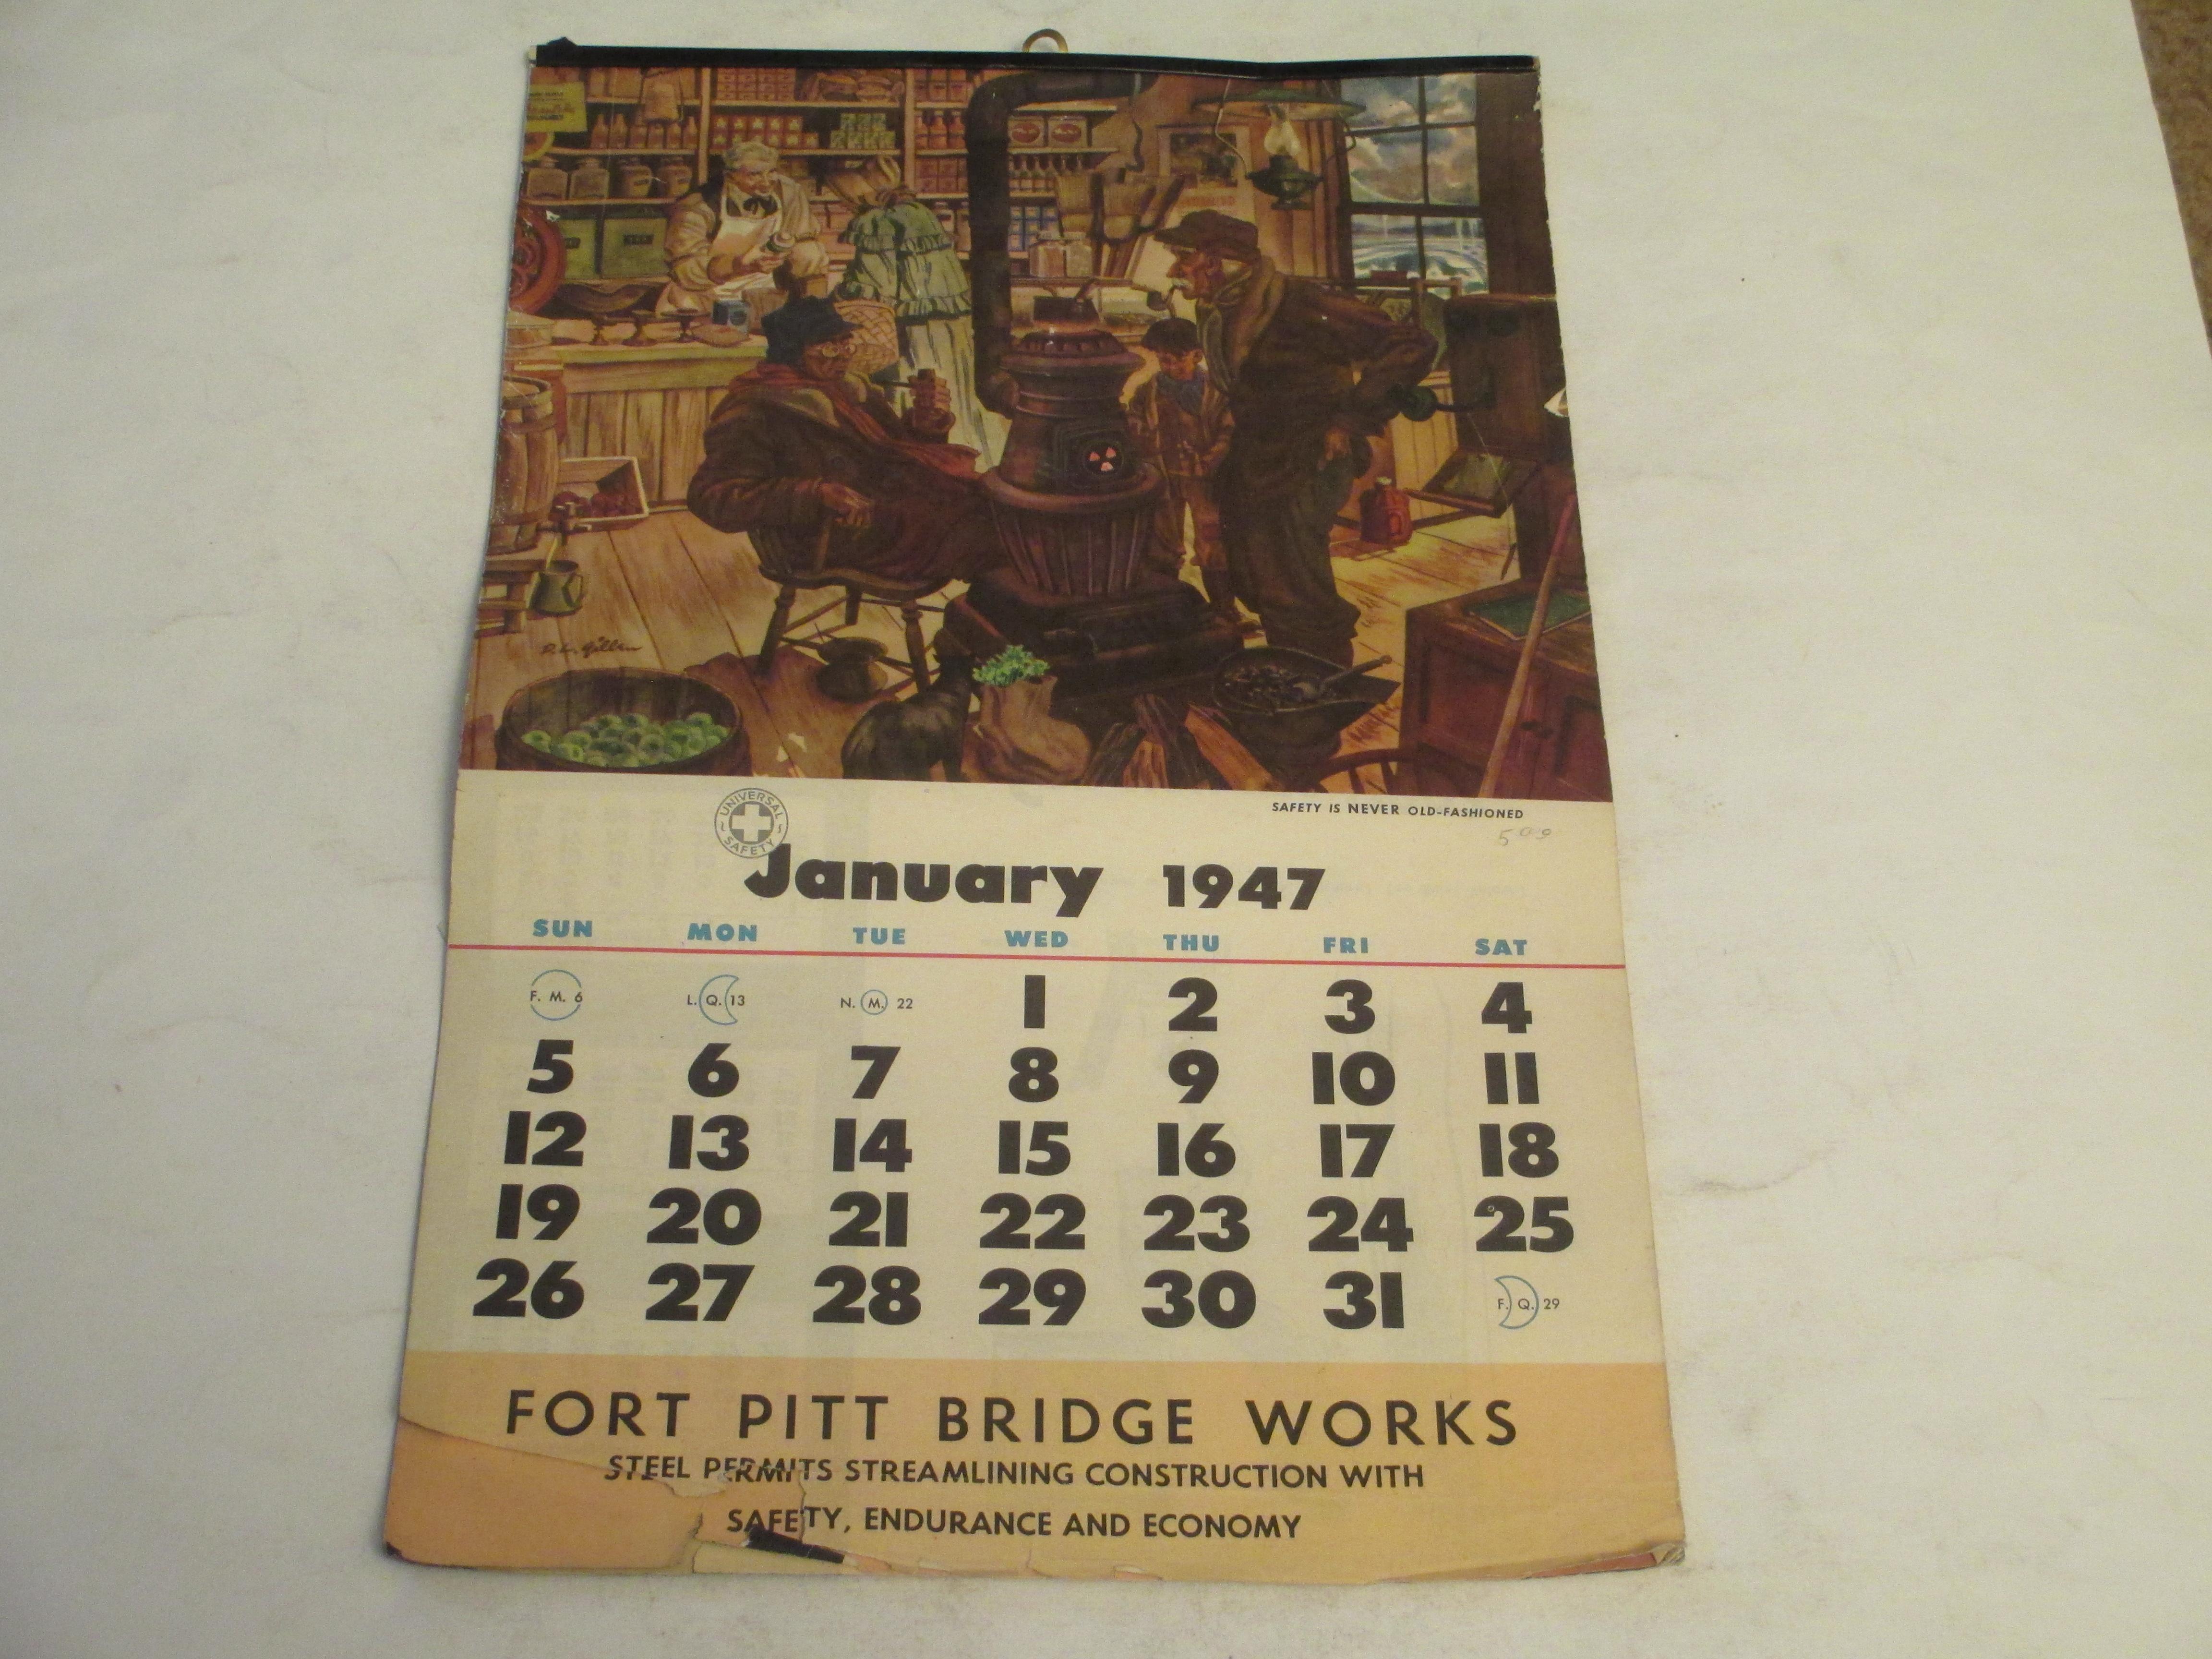 Crowntiques Com Fort Pitt Bridge Works 1947 Wall Calendar